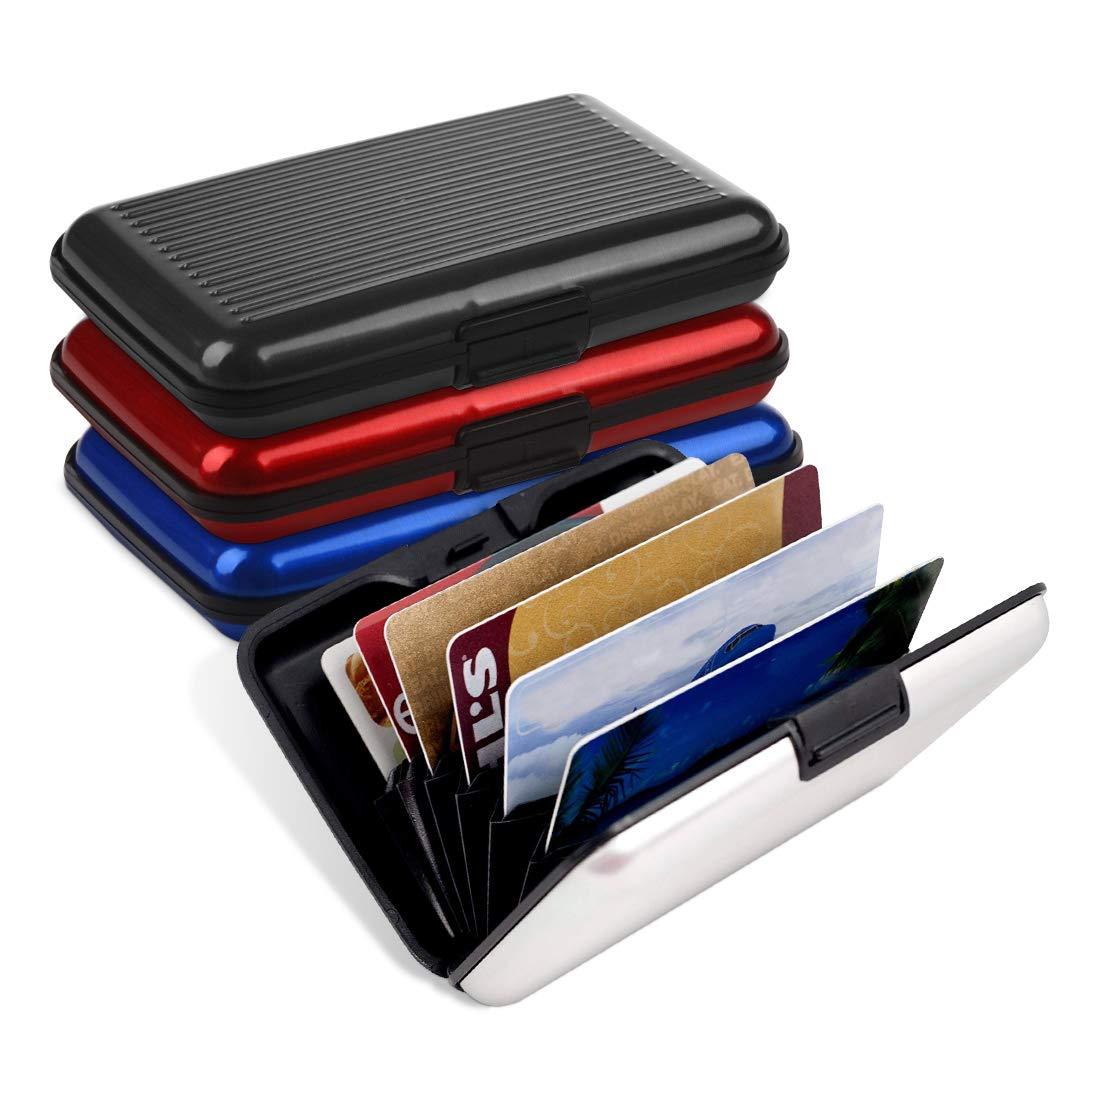 Security Credit Card Wallet-2